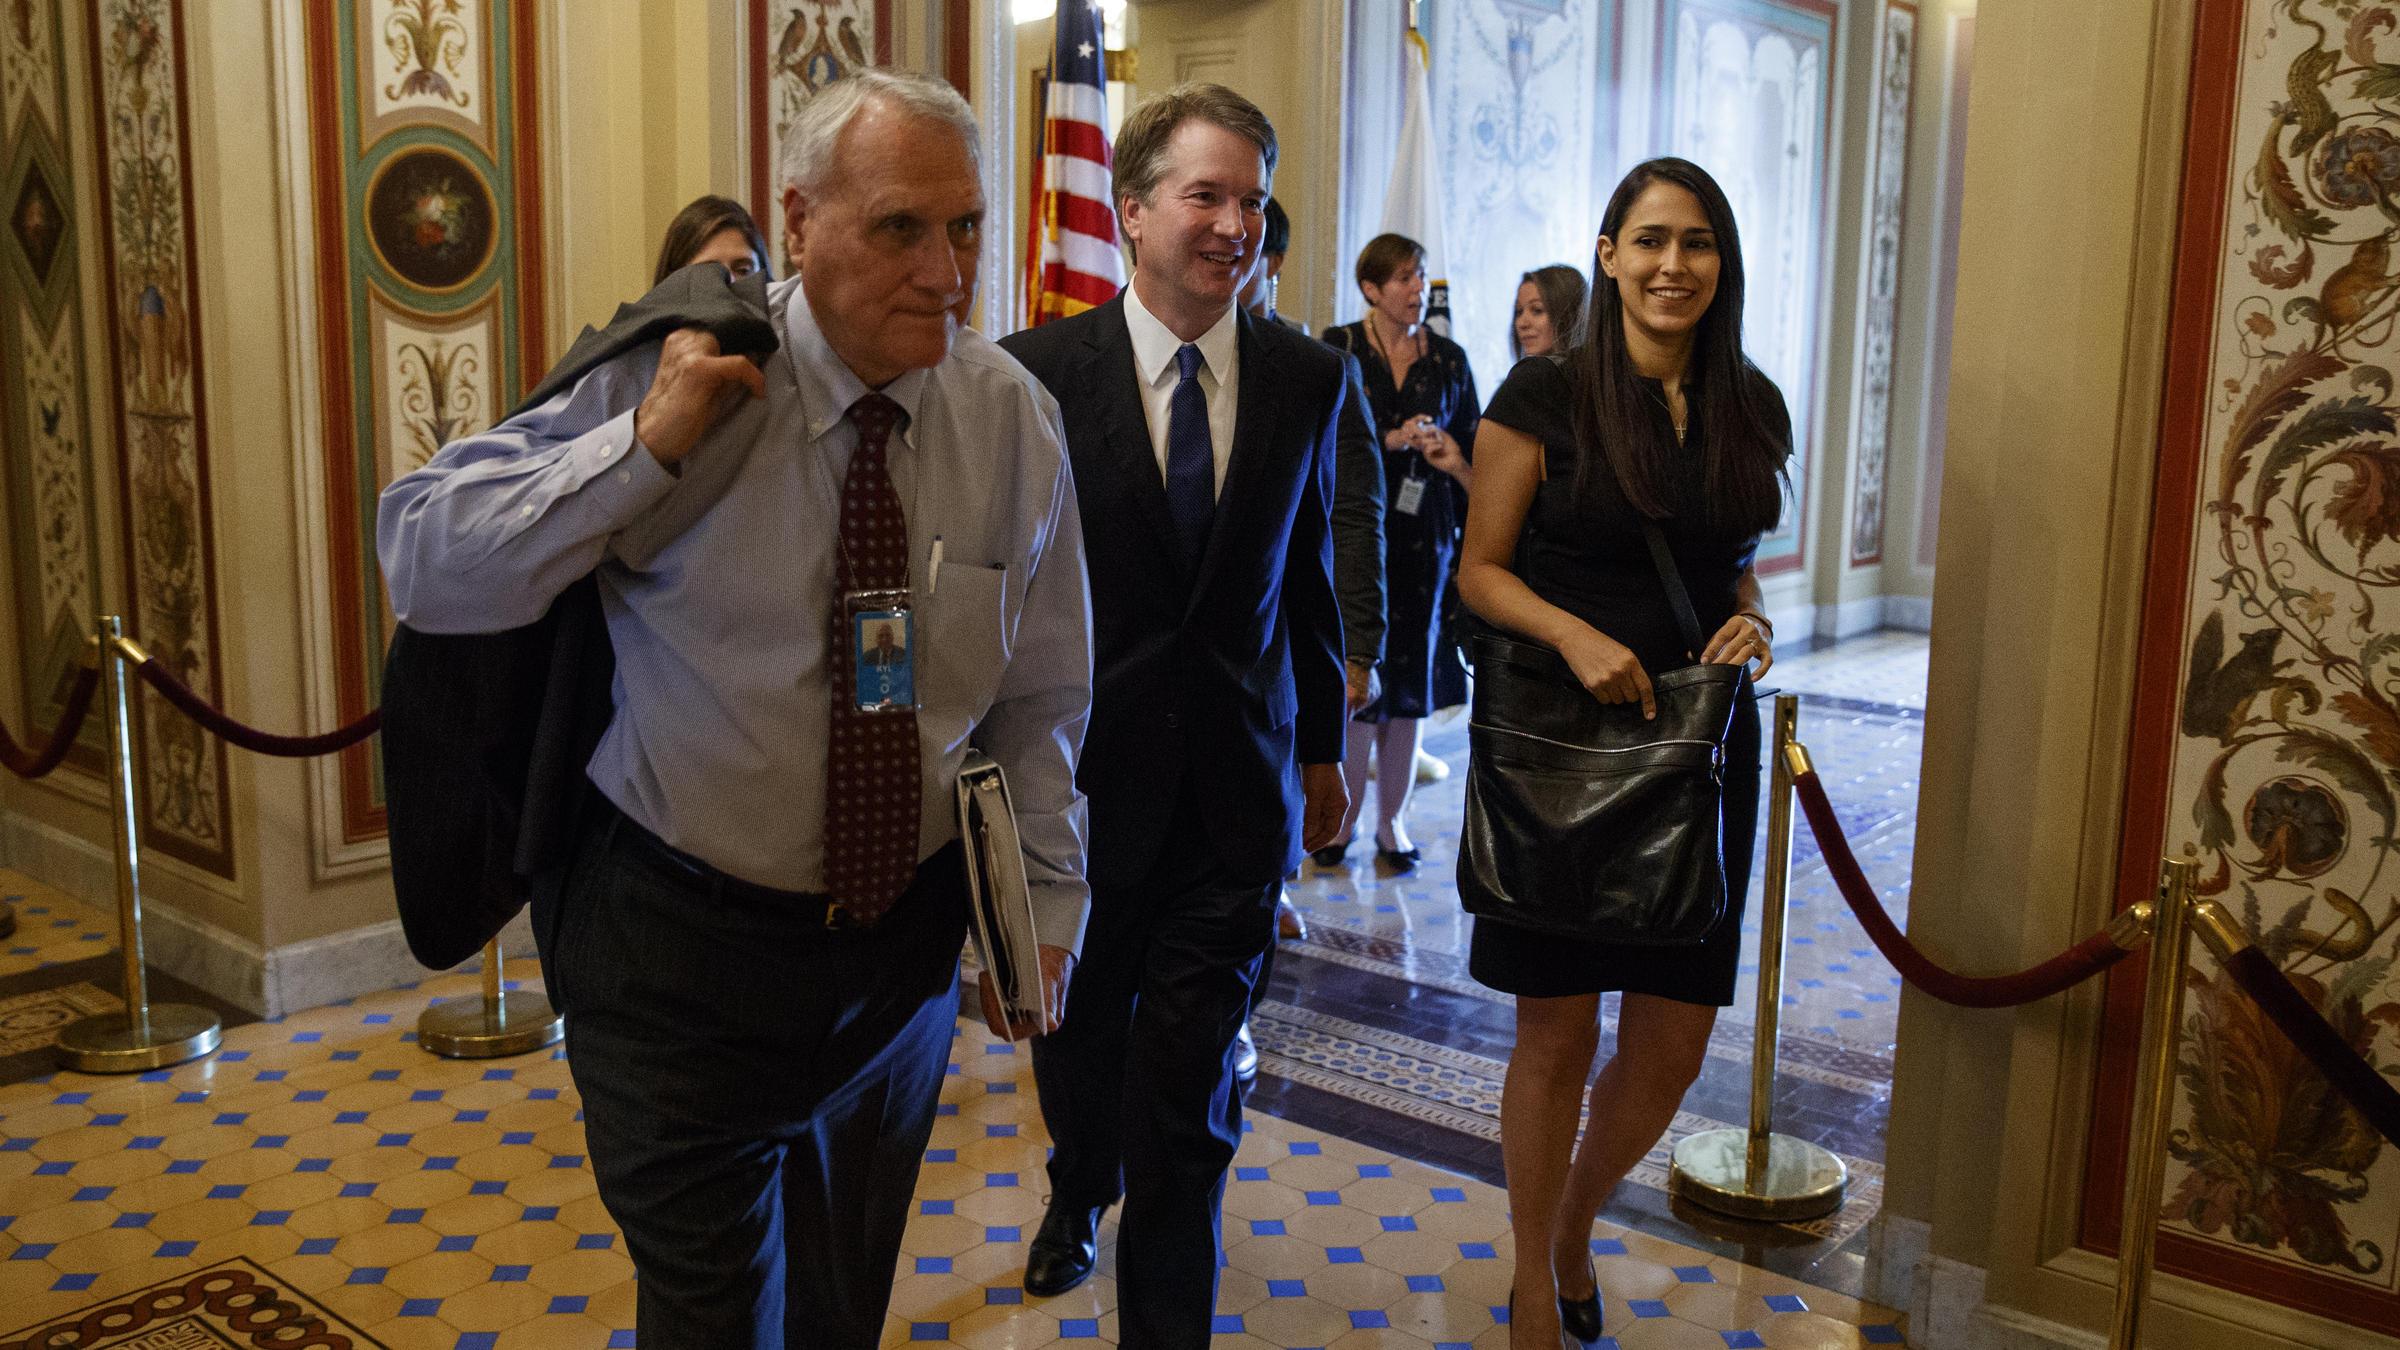 Former Republican US Senator Jon Kyl to replace McCain; wins bipartisan praise